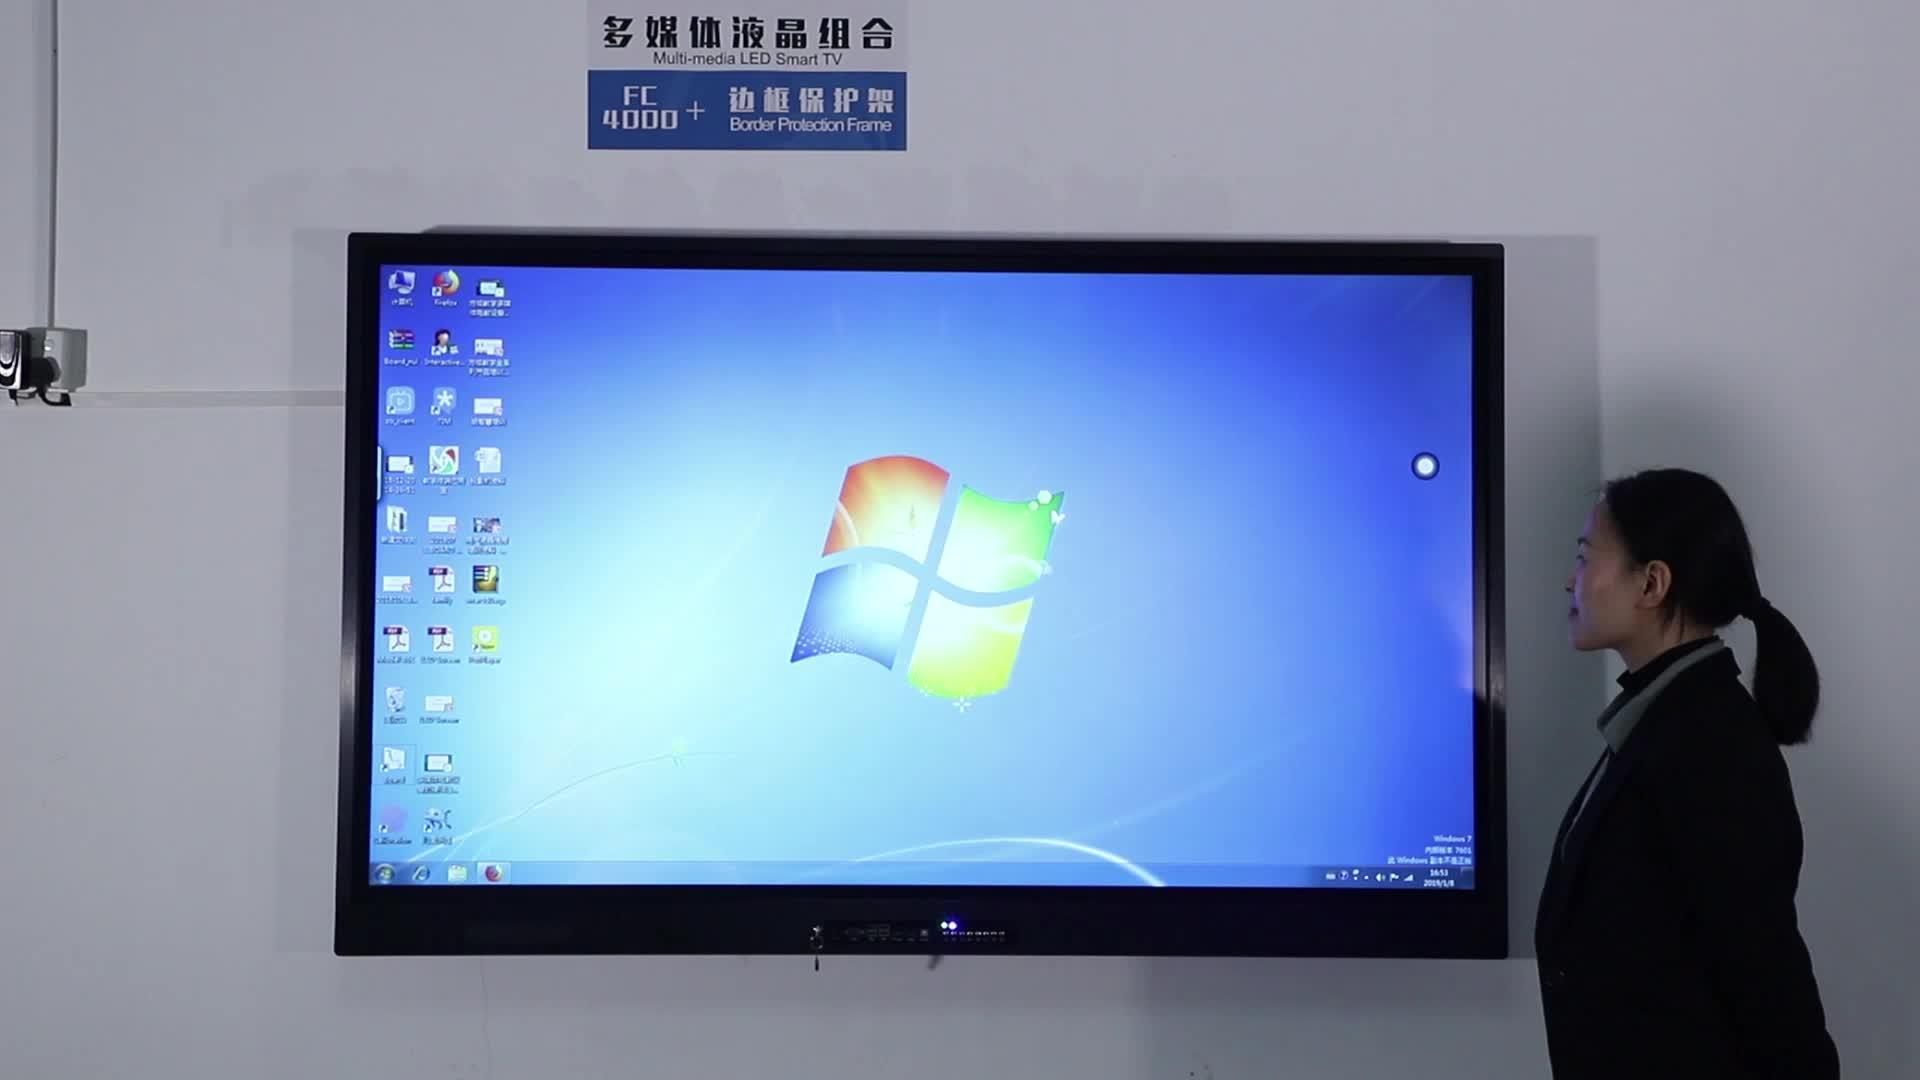 65 pulgadas 4 K infrarrojos Pantalla táctil interactiva para los profesores